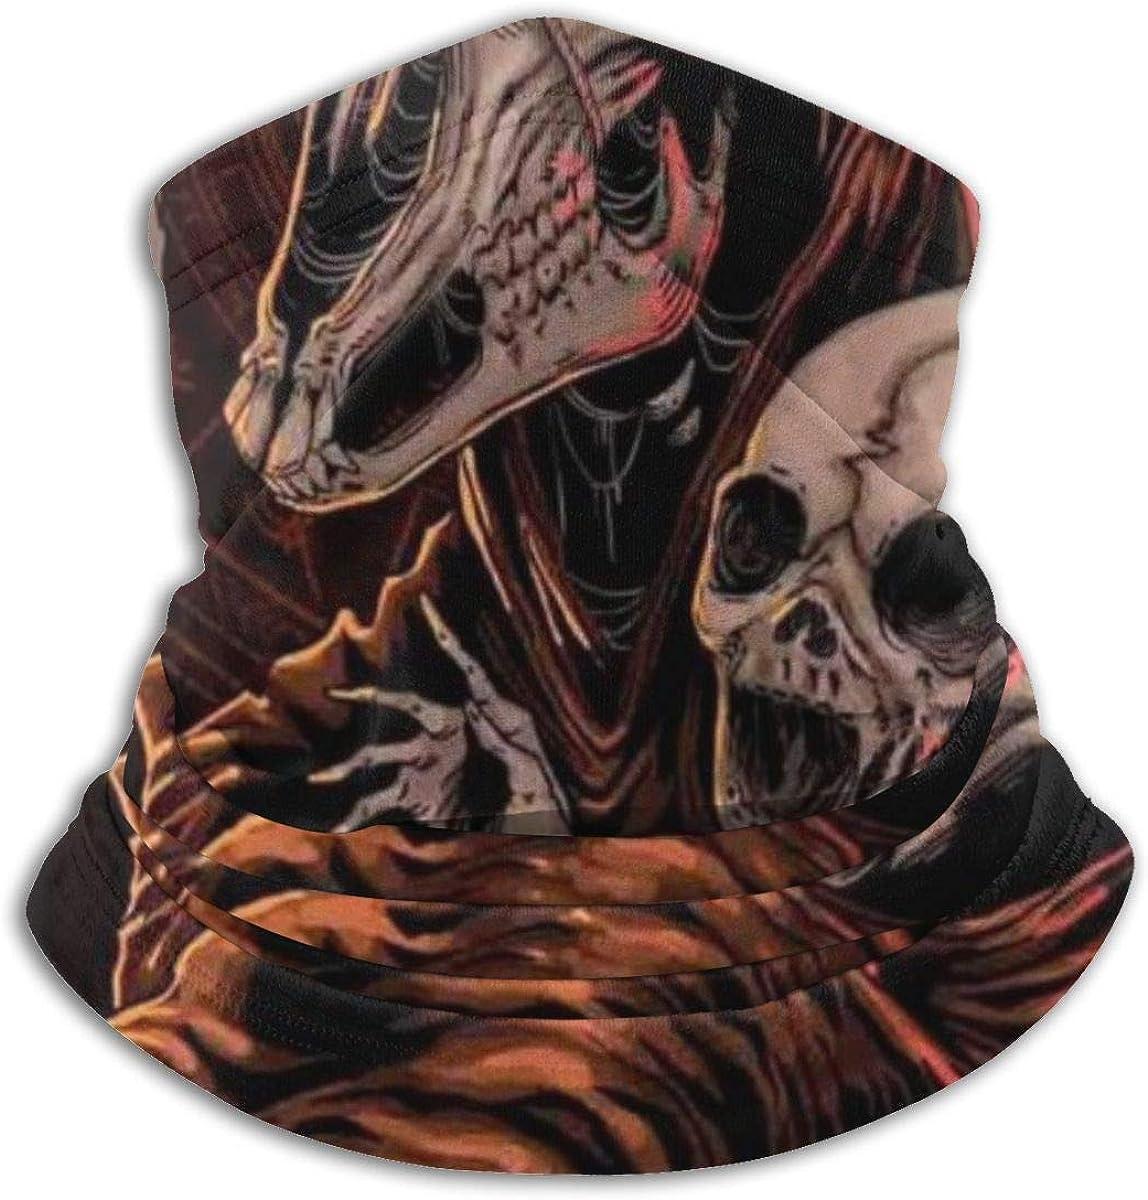 CLERO& Scarf Fleece Neck Warmer Baphomet Satanic Goat Head Baby Skull Windproof Outdoor Headwear Comfortable Neck Gaiter Warmer Face Mask for Cold Weather Winter Outdoor Sports